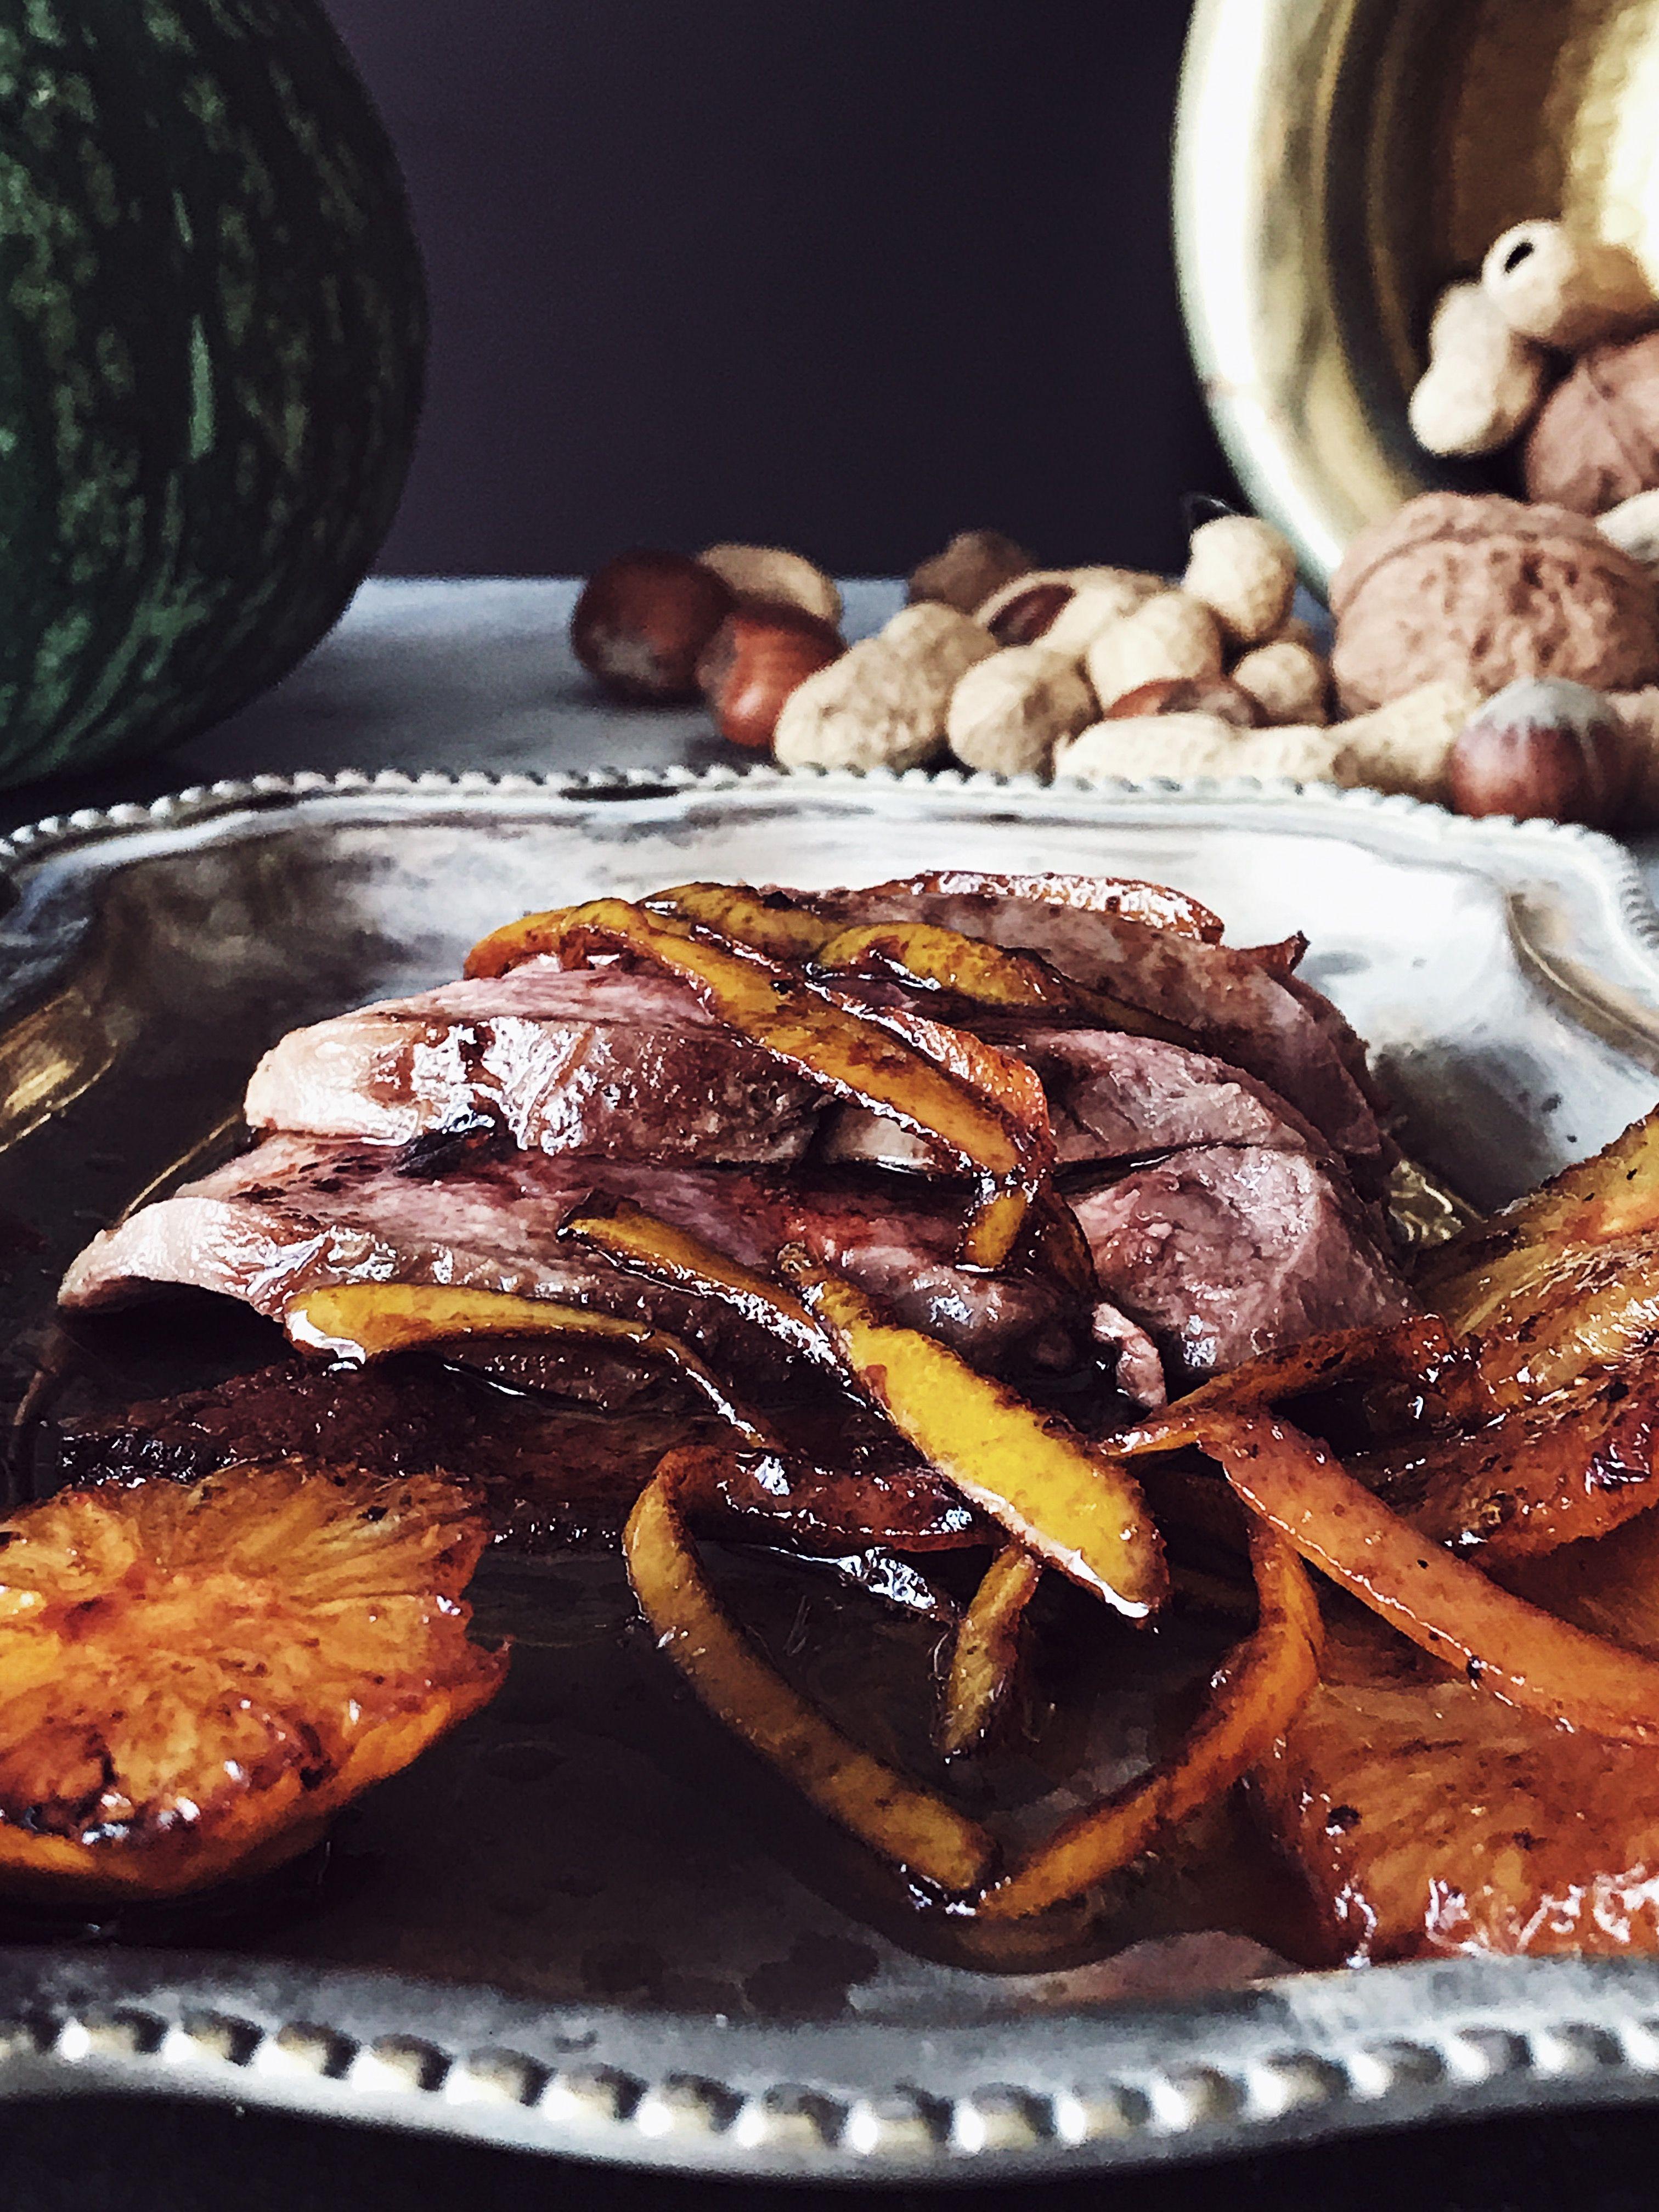 Christmas Dinner Ideas An Italian Menu Get This Orange Duck Recipe And